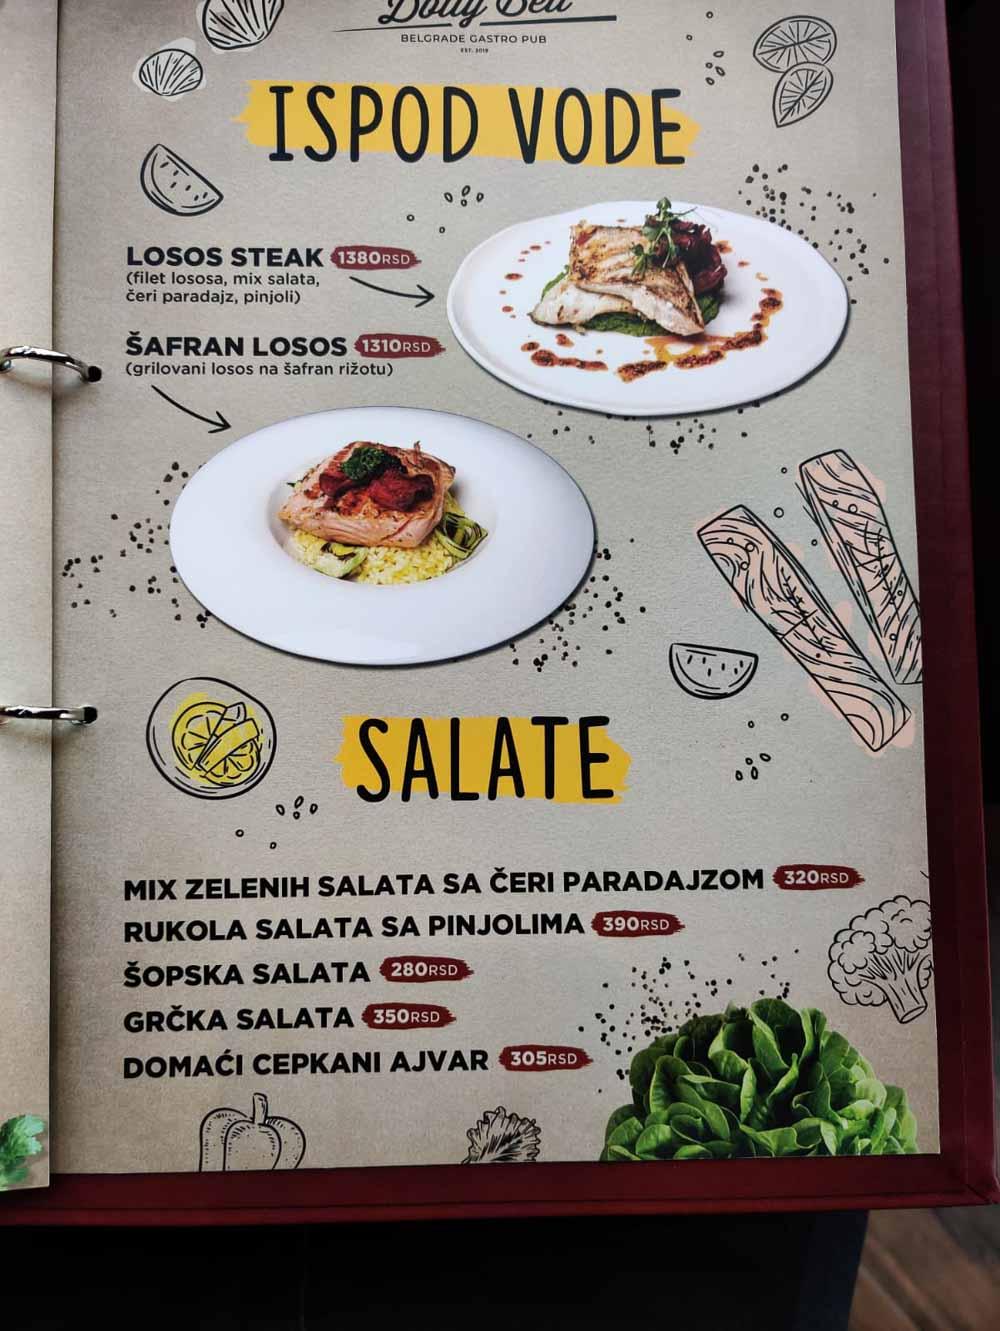 restoran dolly bell cene pica